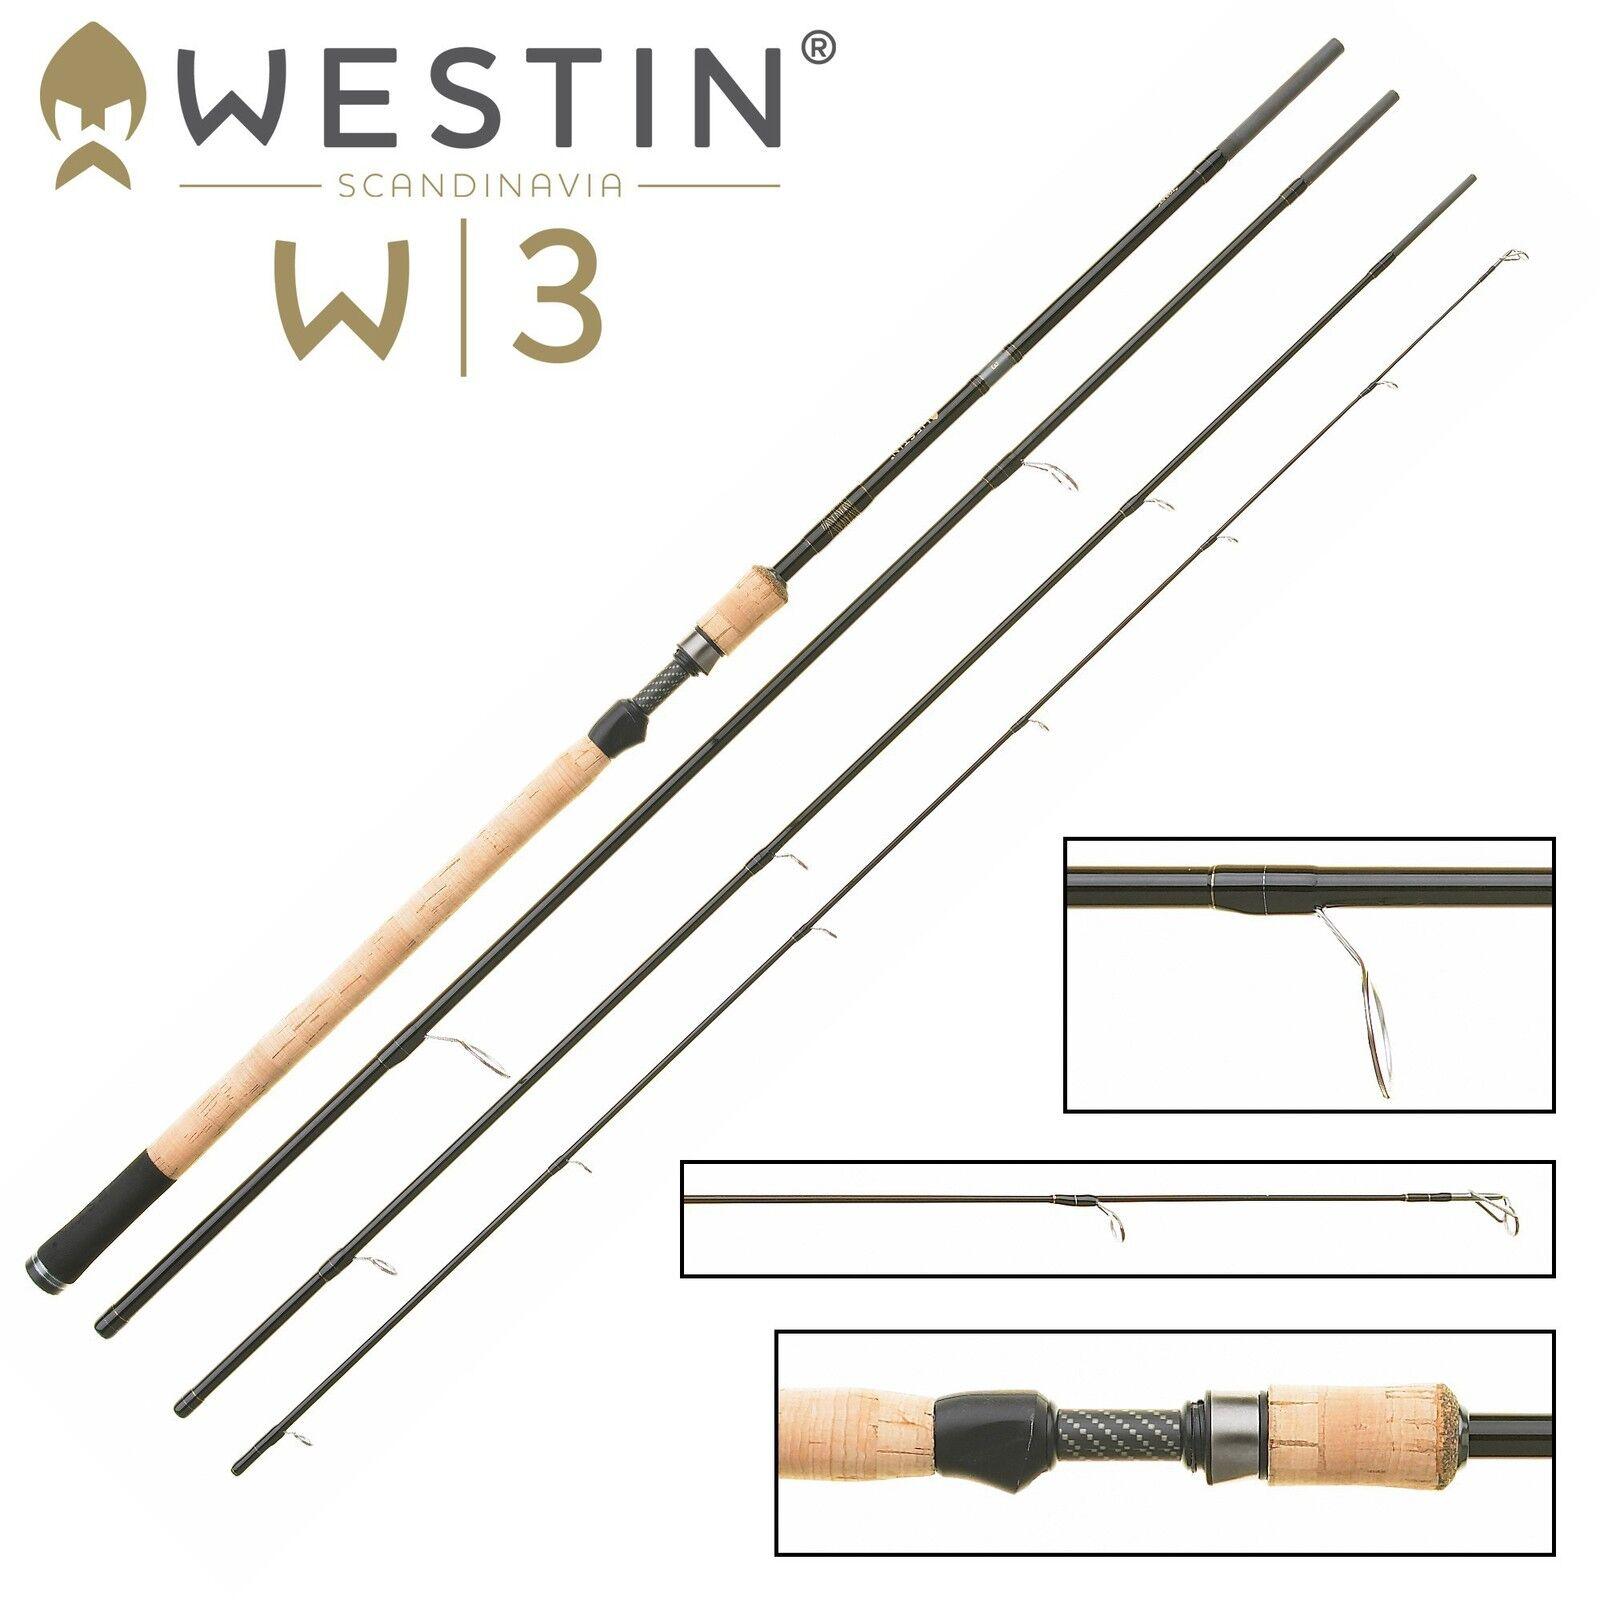 Westin Westin Westin W3 Ultralight Spin M 390cm 7-30g - Angelrute für Forellen, Spirolinorute 9e26e5